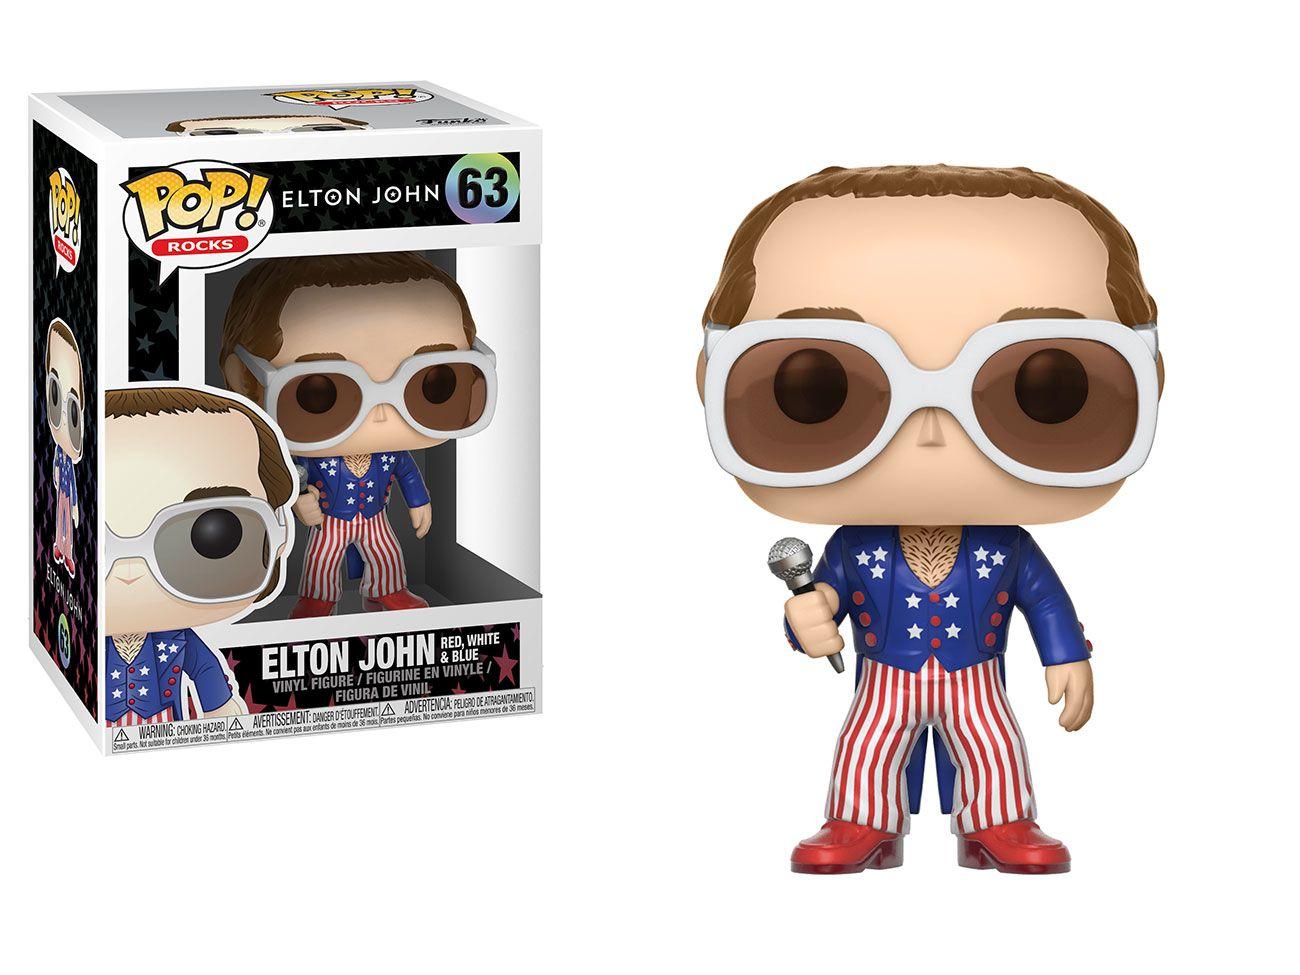 Elton John Red, White & Blue #63 - Funko Pop! Rock